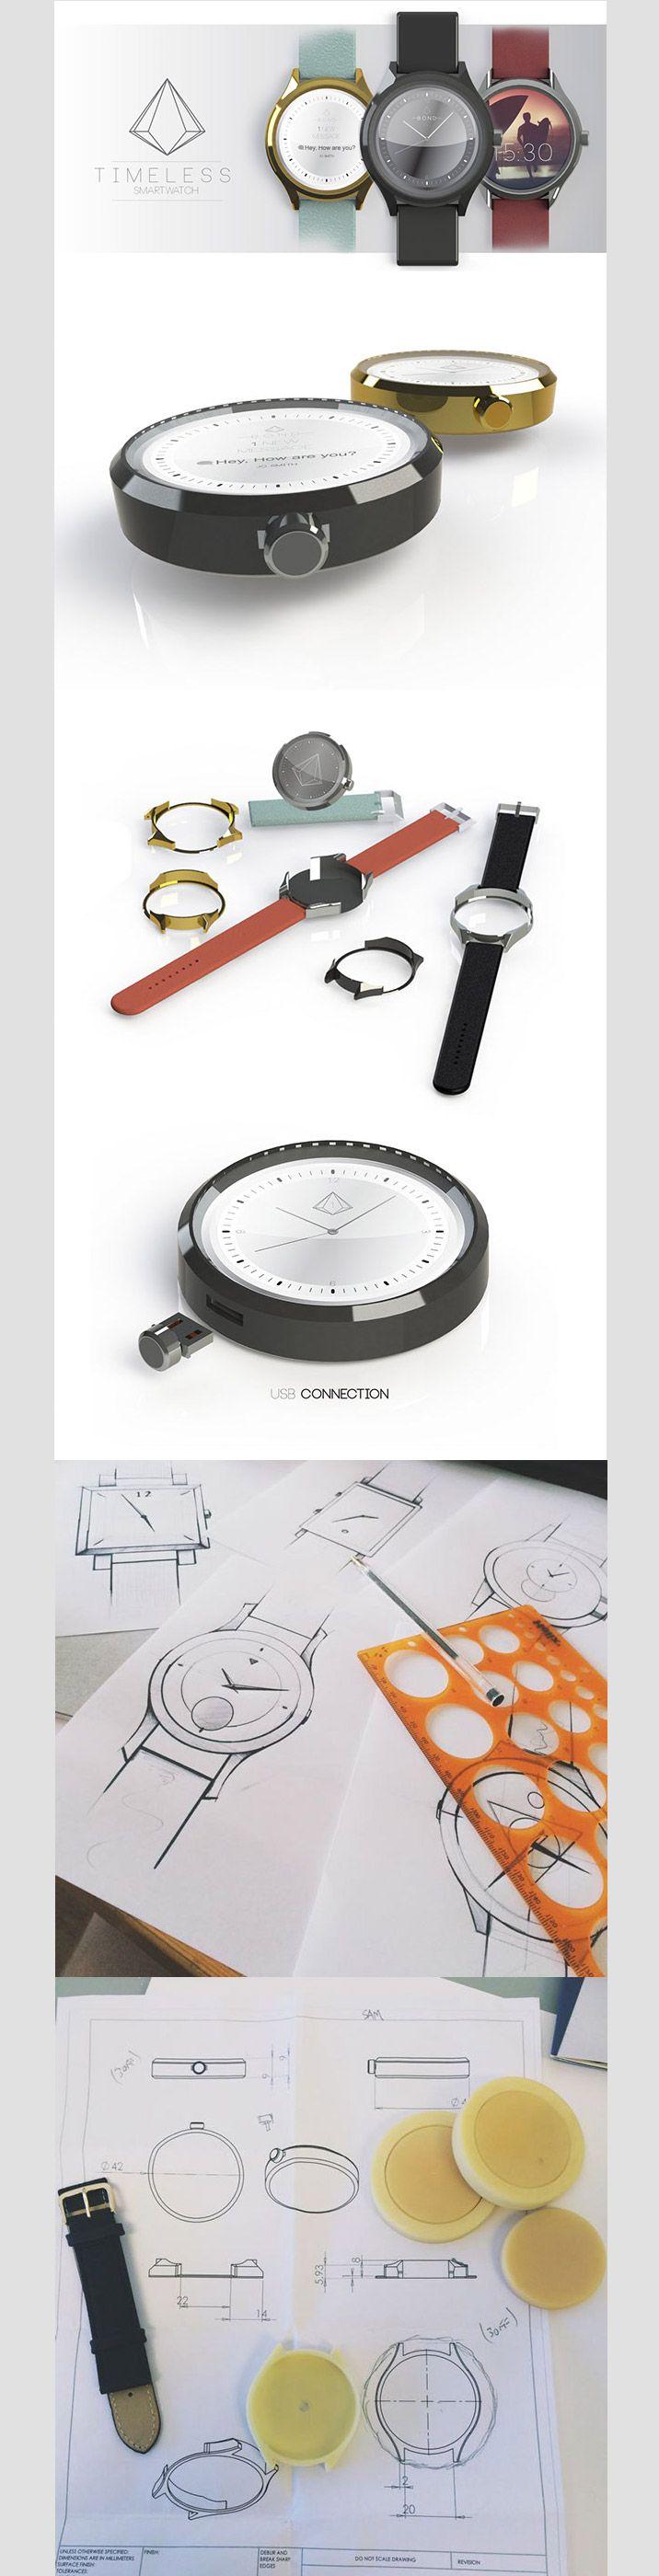 Timeless smartwatch UI concept http://www.cssdesignawards.com/articles/23-smartwatch-ui-designs-concepts/114/